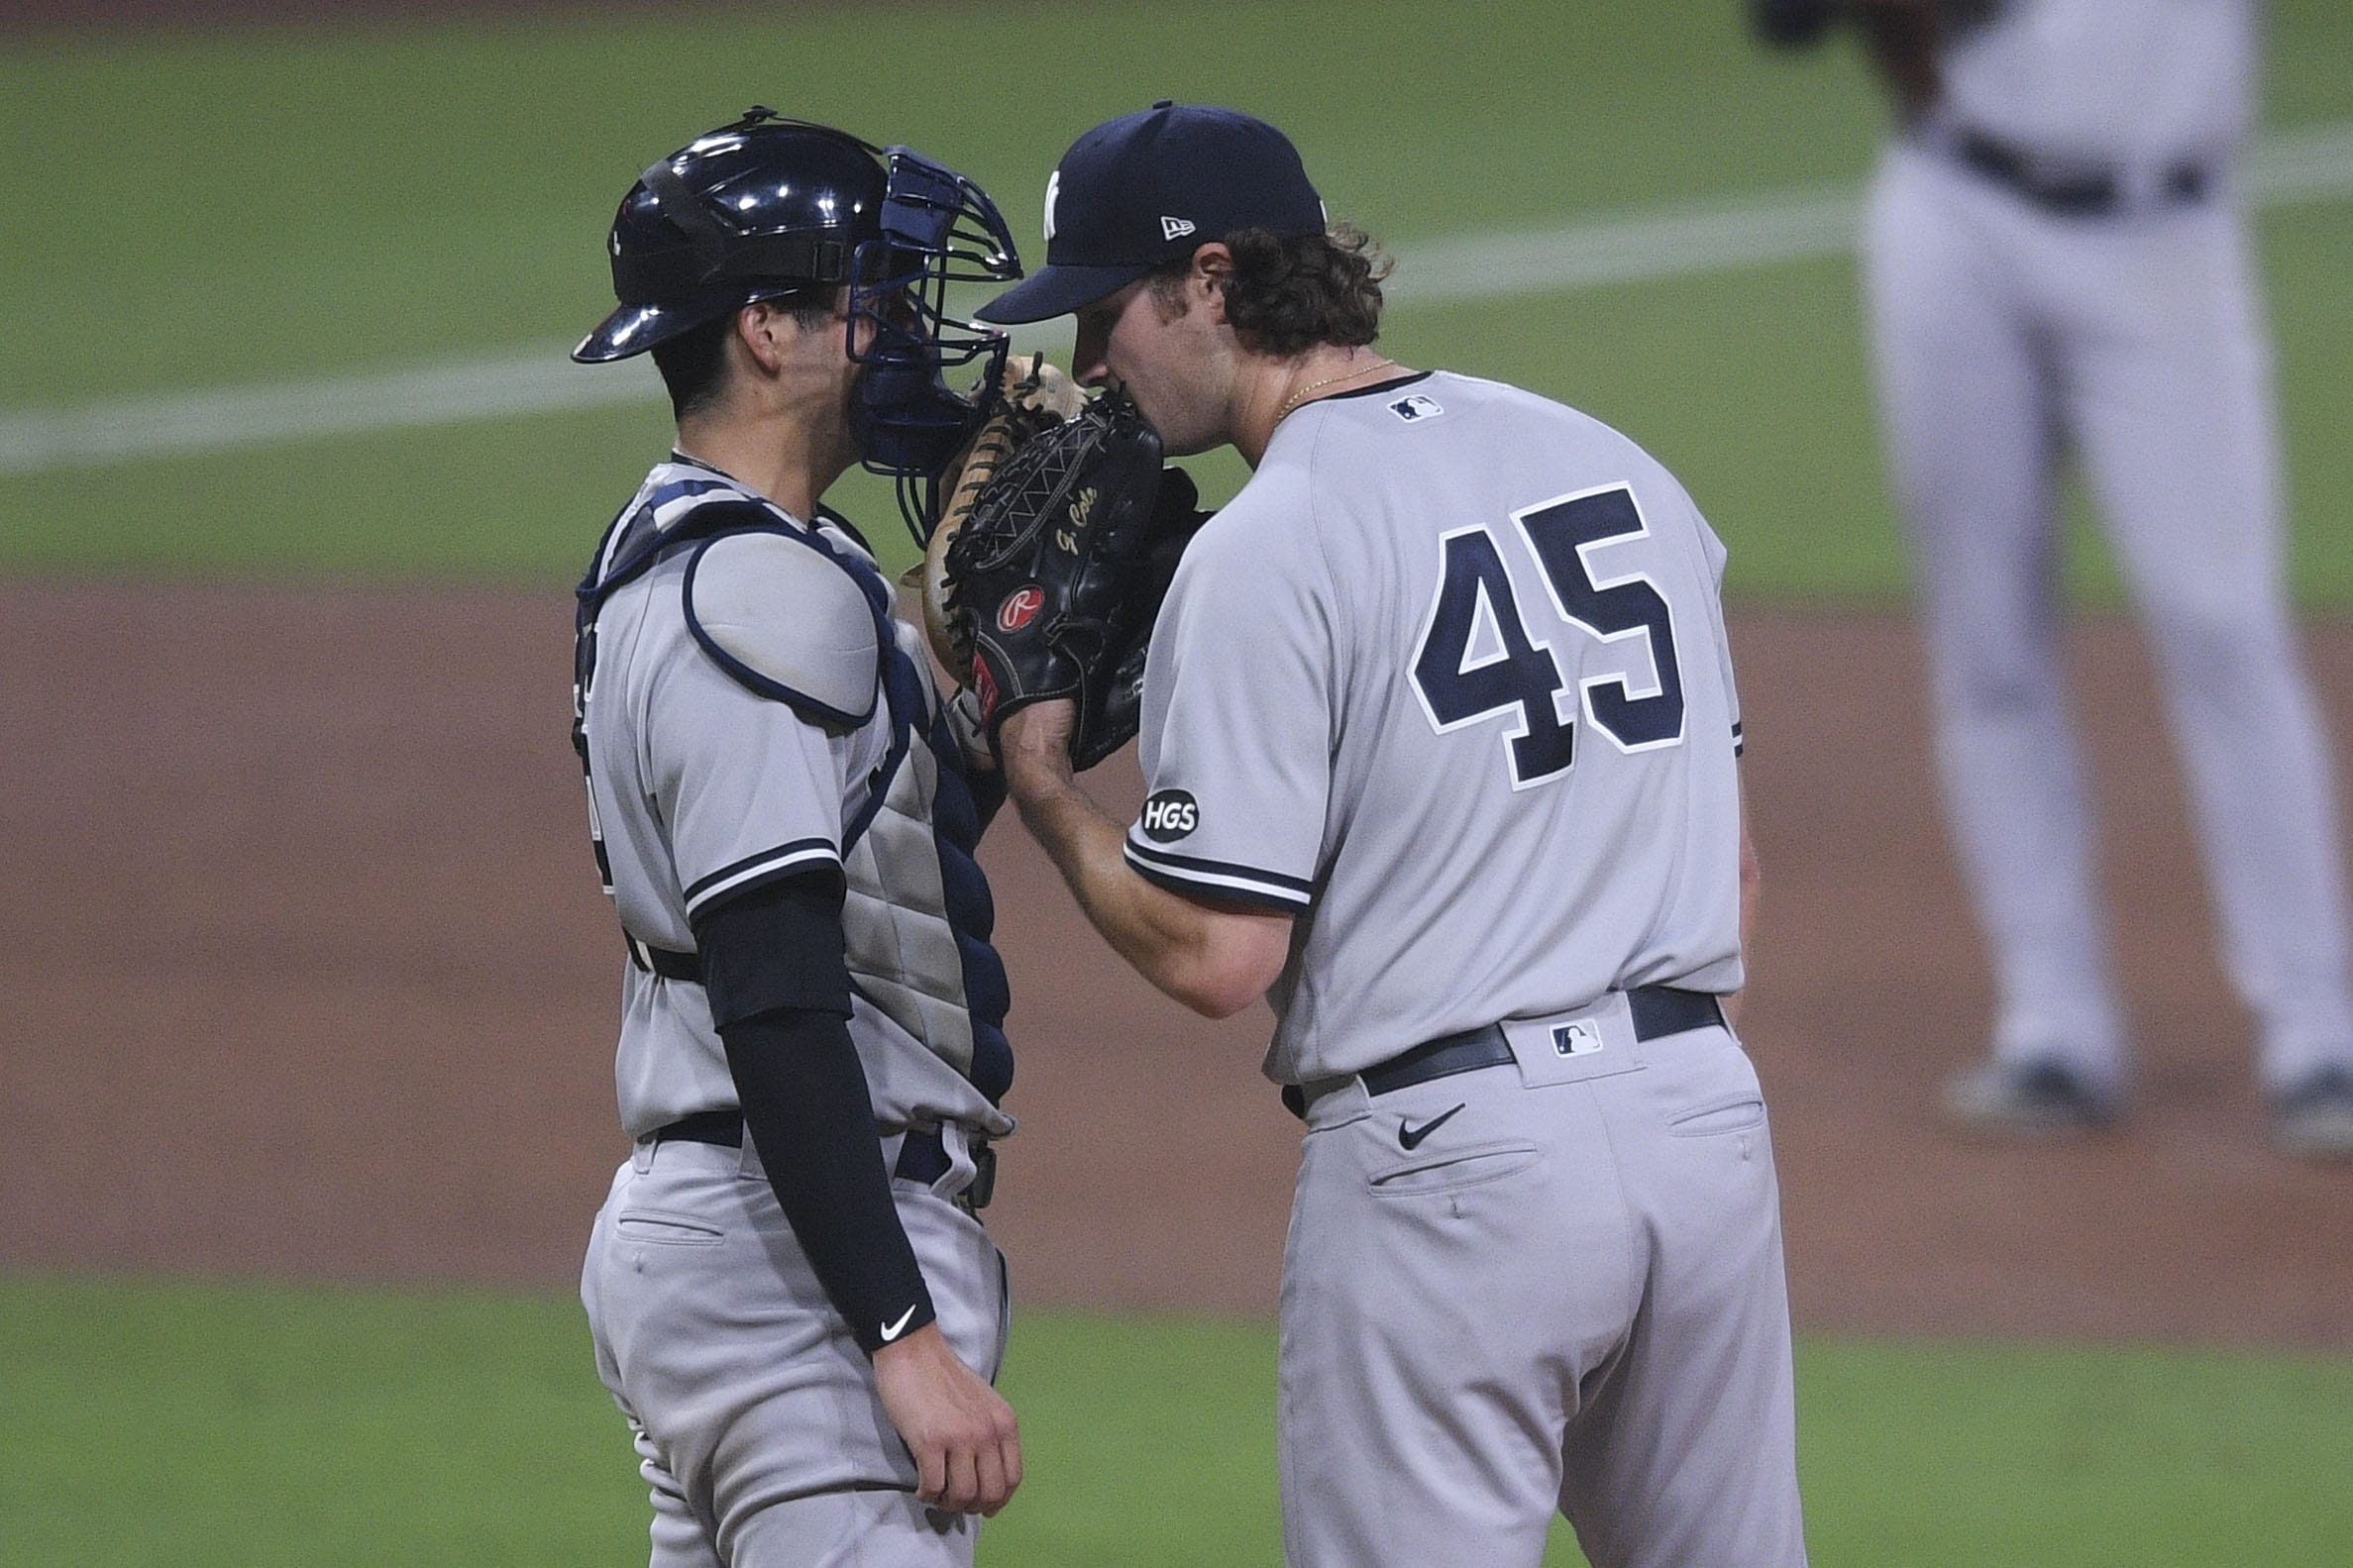 New York Yankees, Kyle Higashioka, gerrit cole